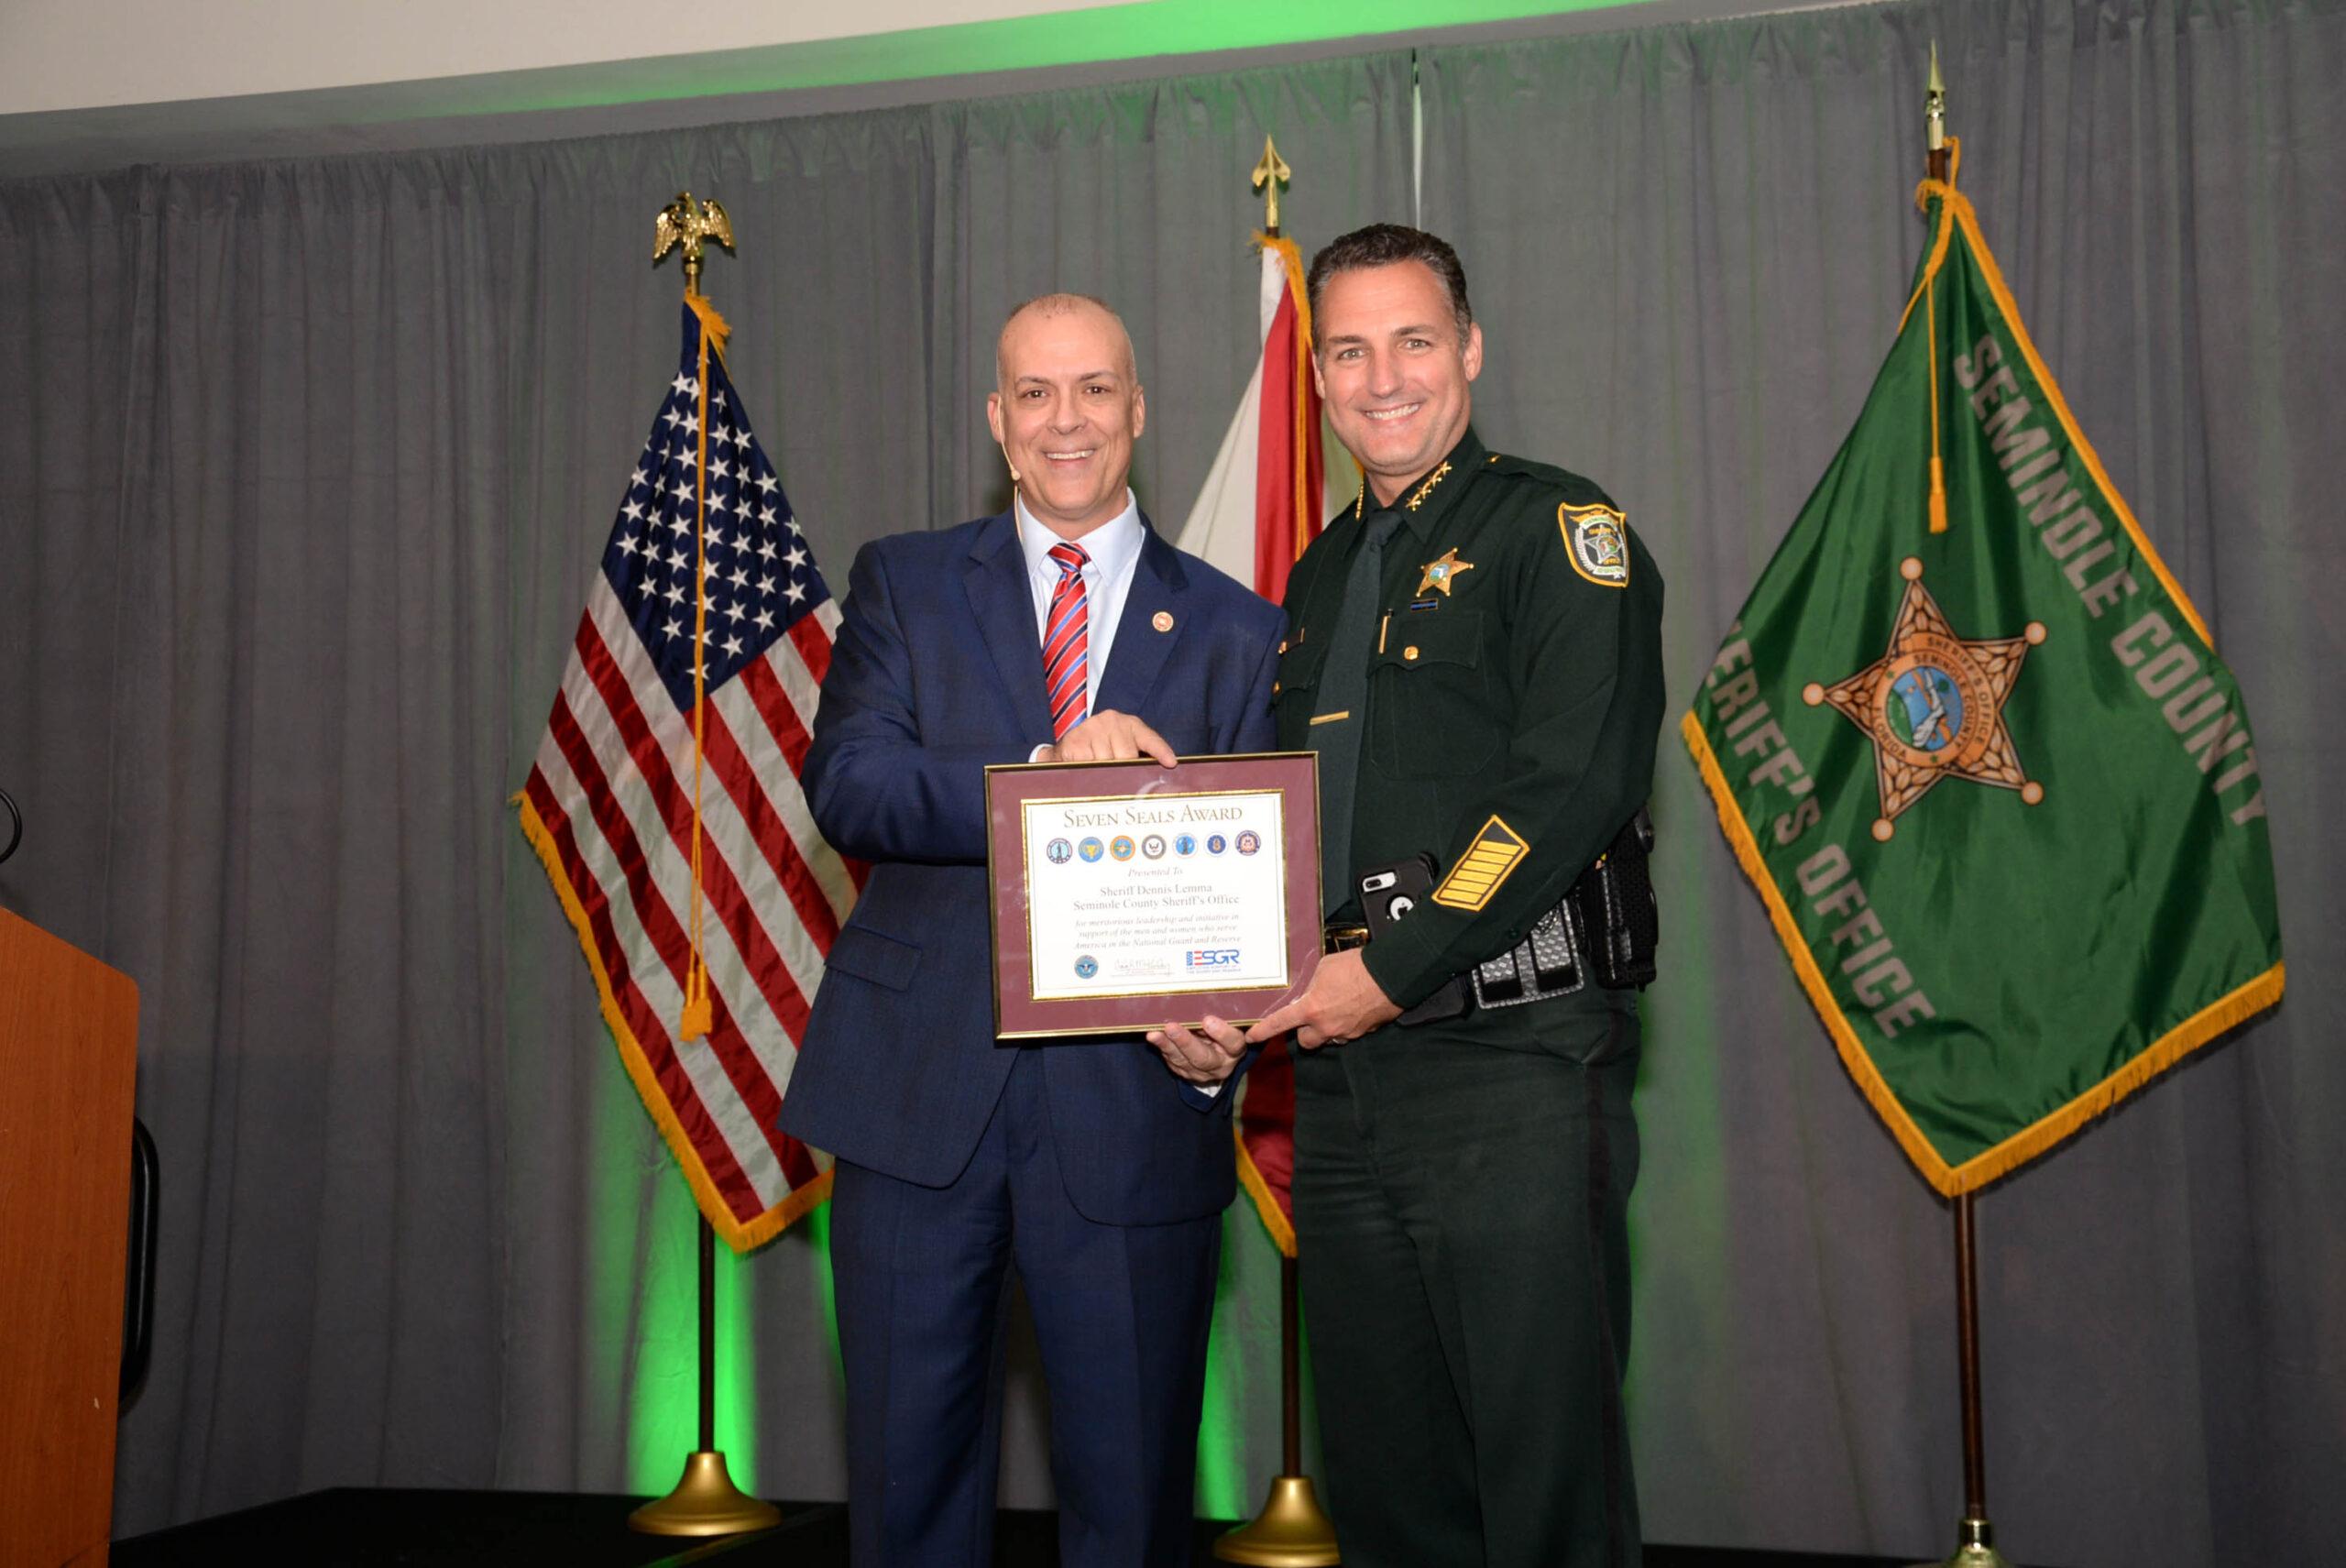 James Dicks and Seminole County Sheriff Lemma